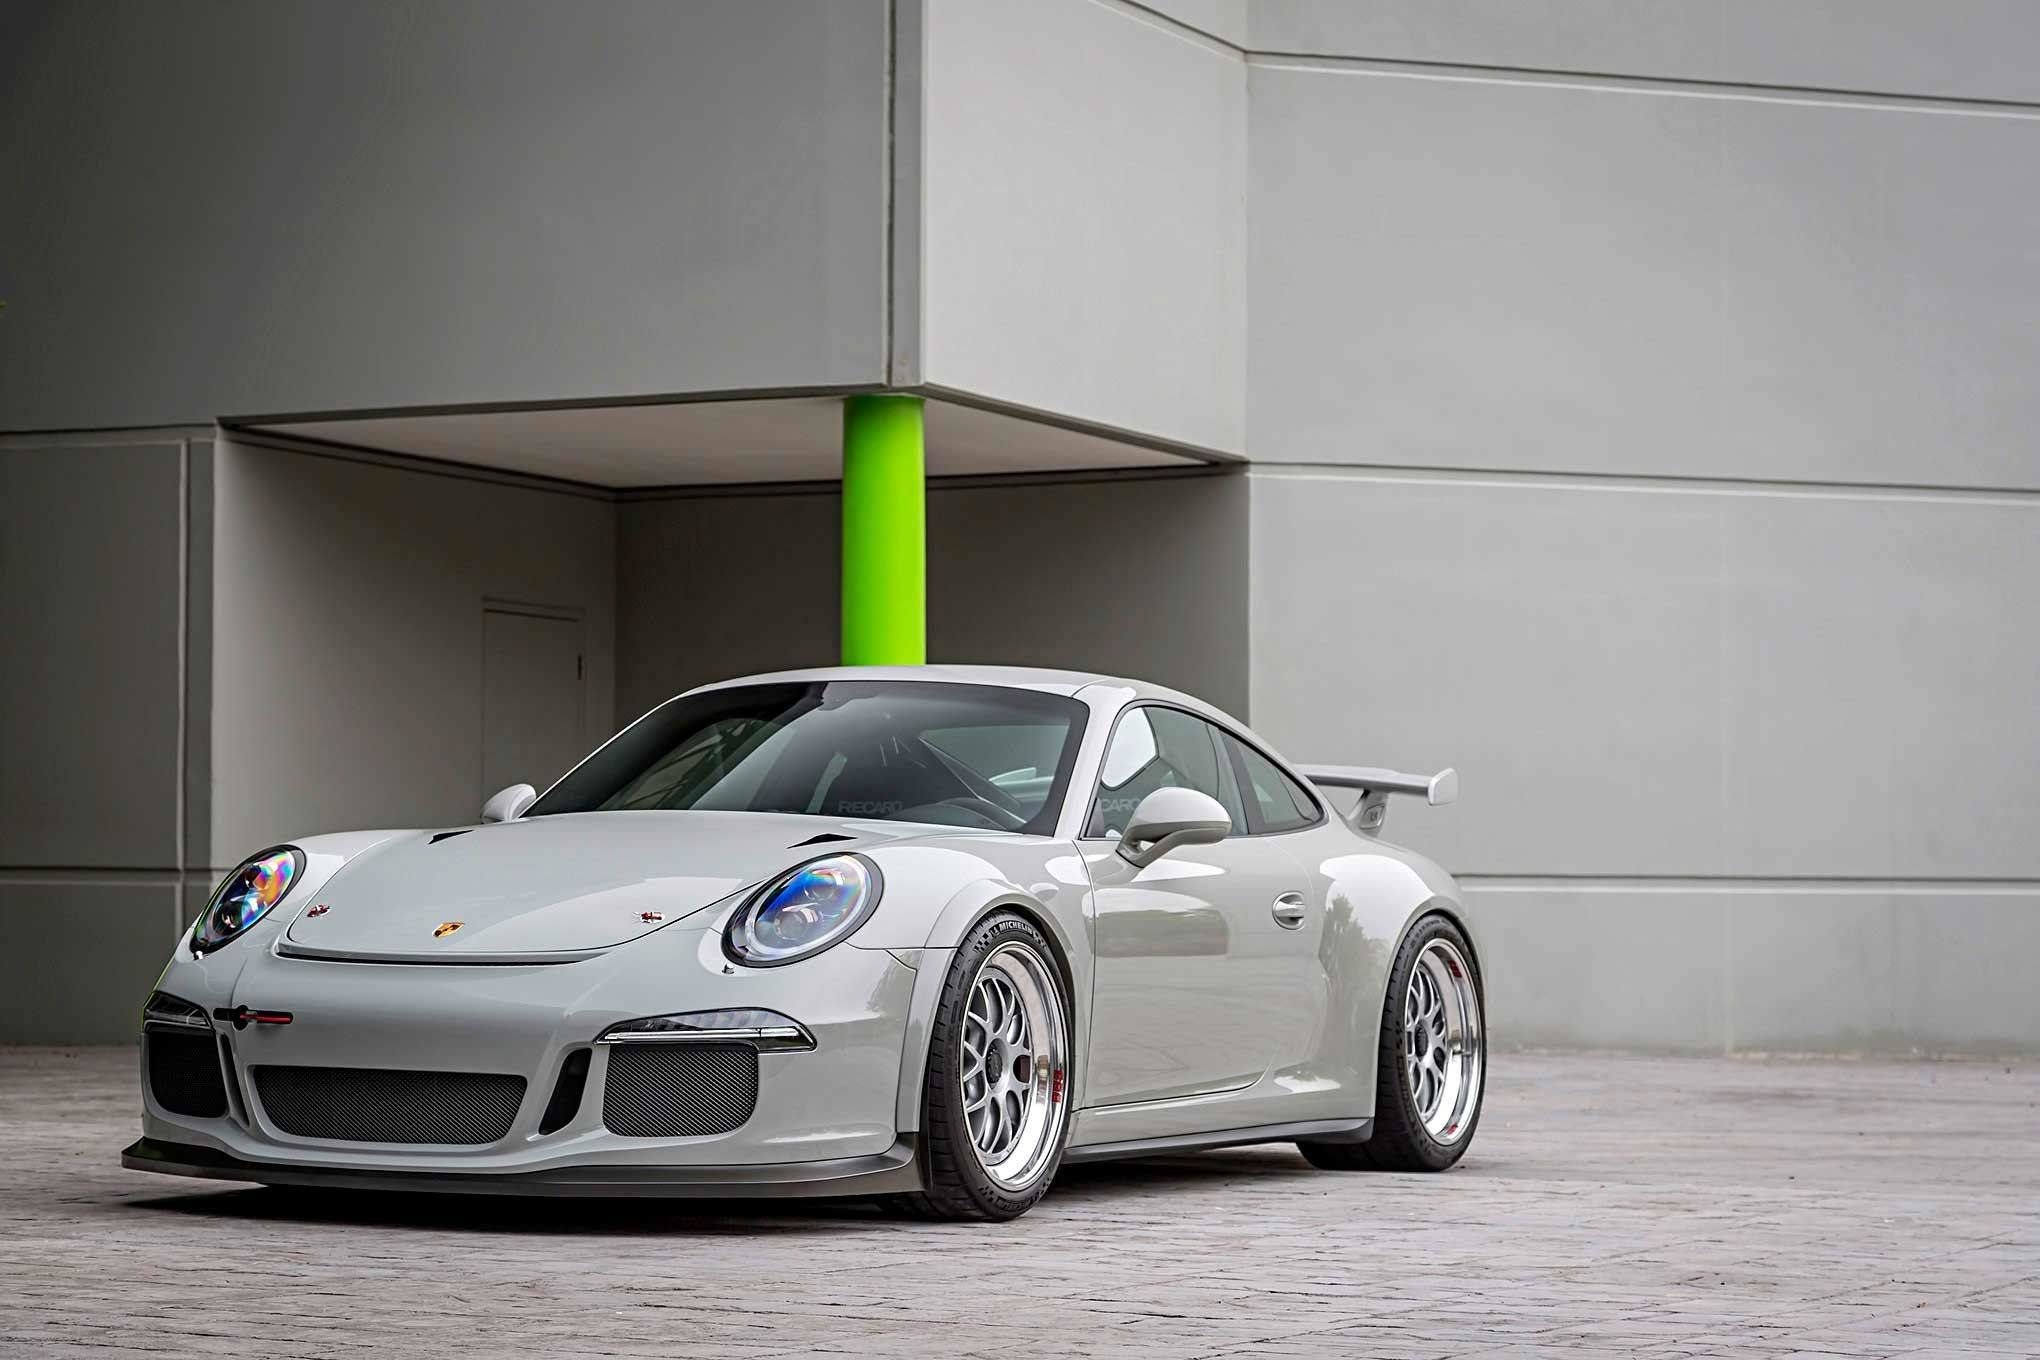 Fashion Grey Porsche 991 Gt3 W Bbs Motorsport E07 Bbi Street Cup Roll Bar Install Rennlist Porsche Discu Porsche 991 Porsche Motorsport Porsche Panamera